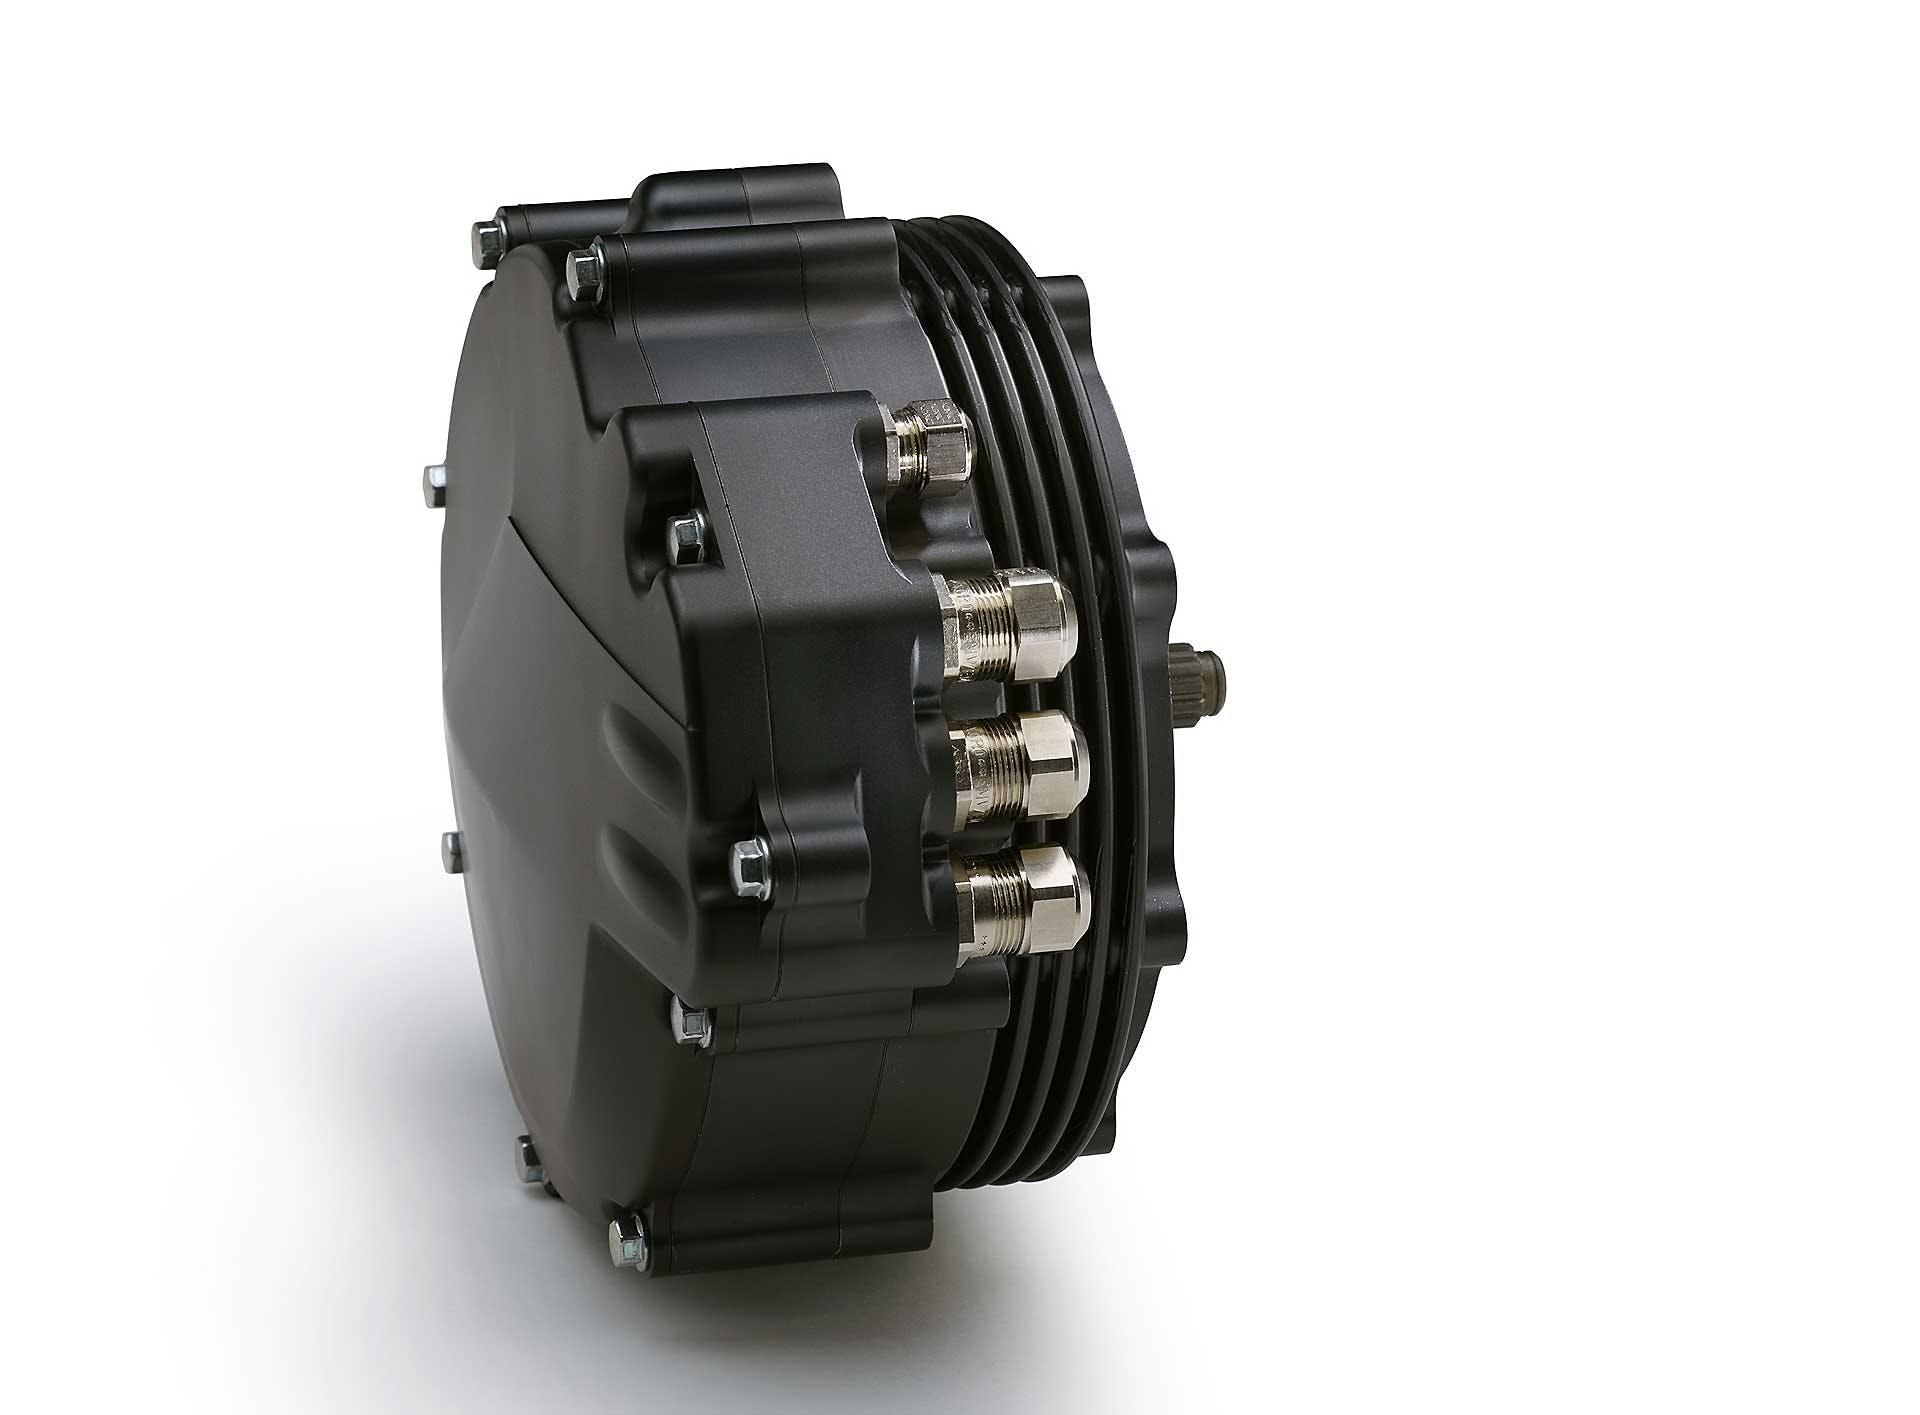 Yamaha TY-E Trial elettrico dettaglio motore elettrico